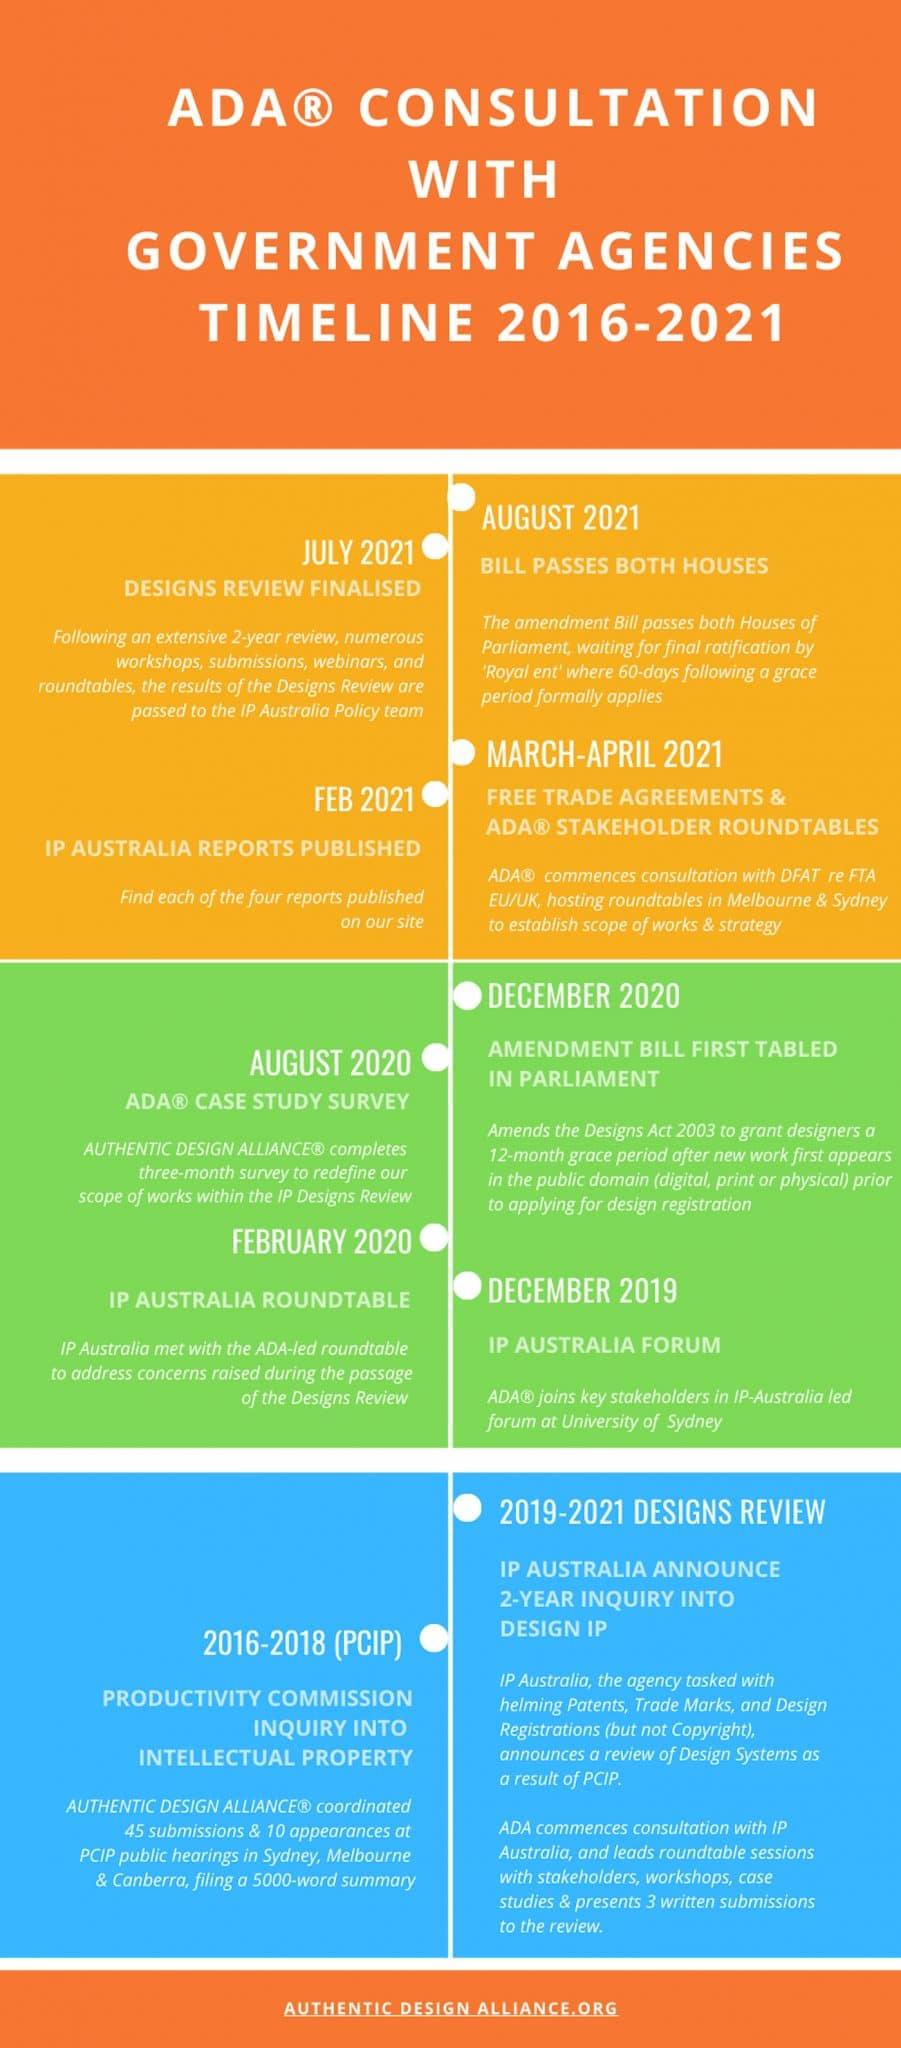 ADA government consultation timeline 2016-2021